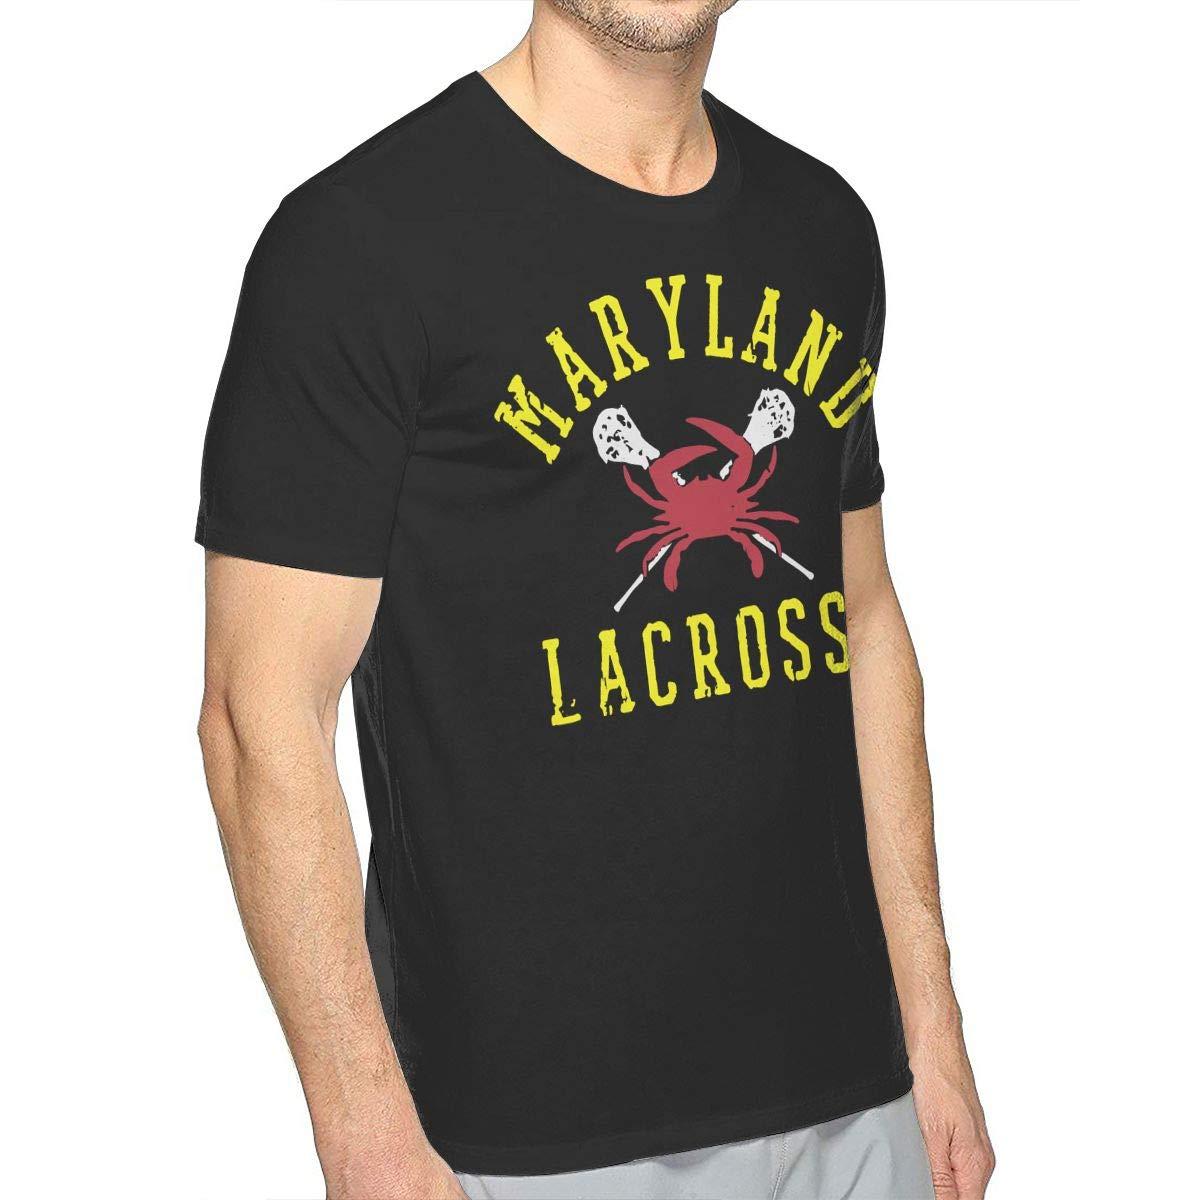 Maryland Crab Lacrosse Mens Sports Short-Sleeved T-Shirt